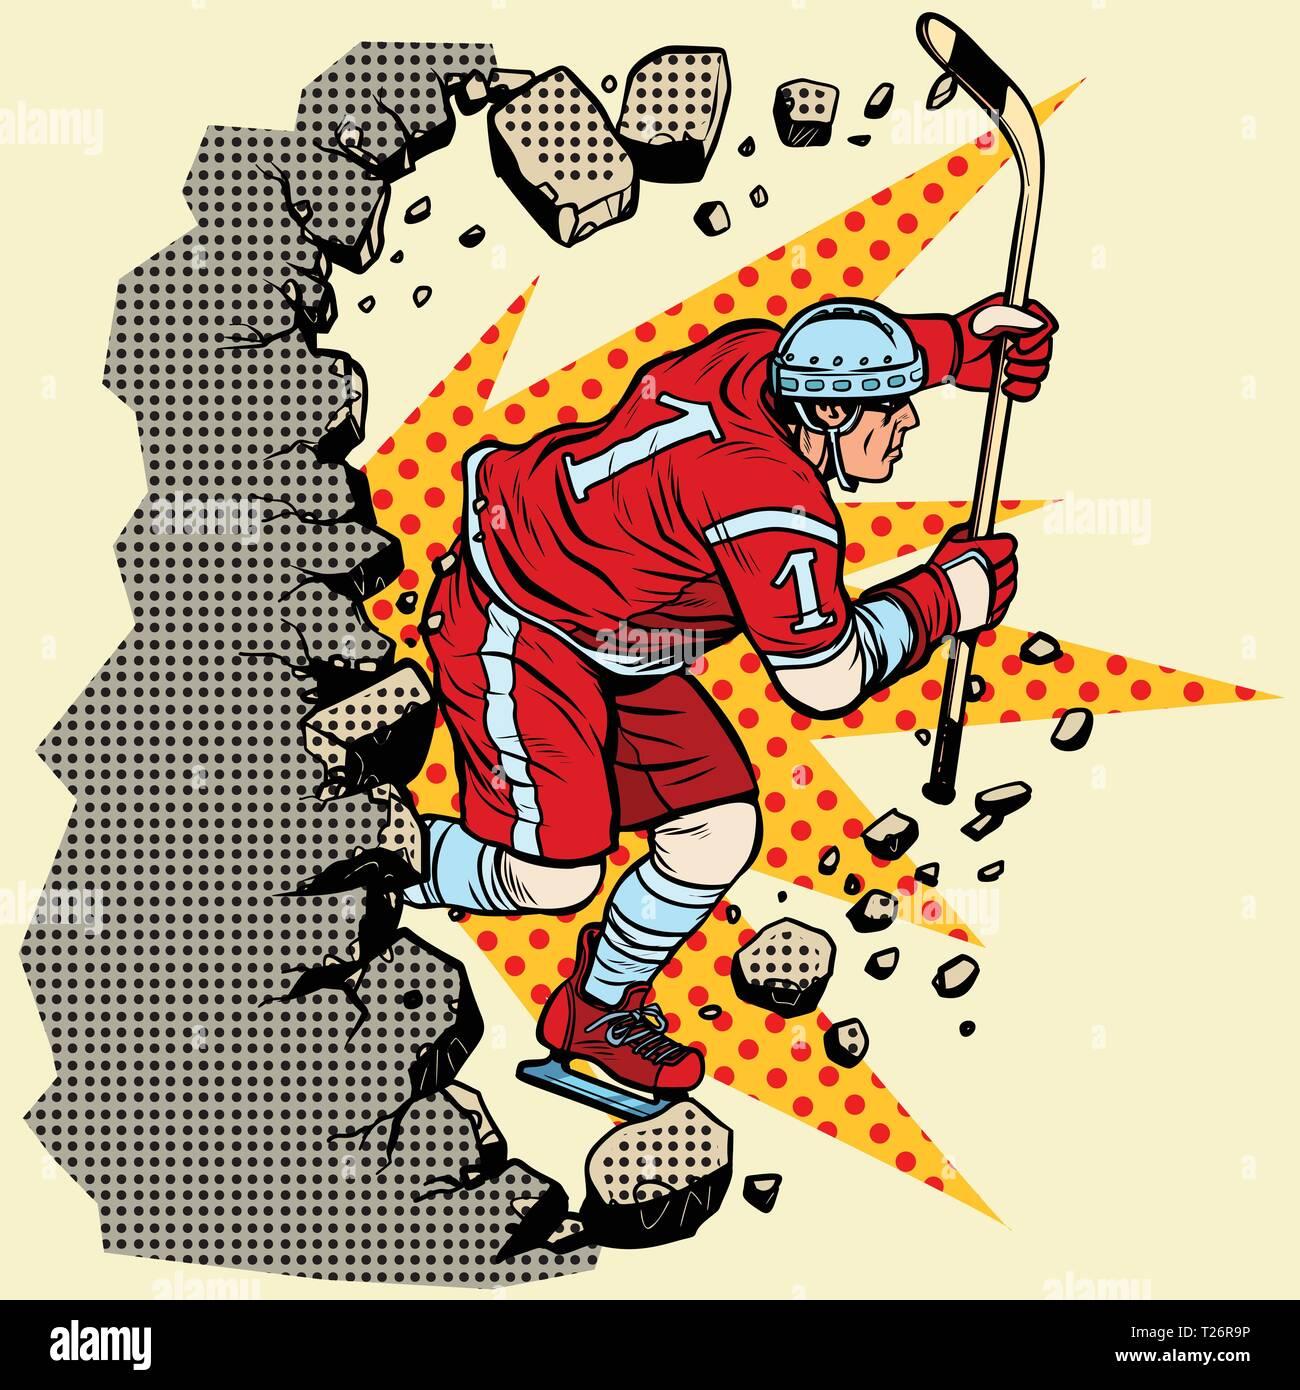 hockey player breaks a wall, winter sport. Moving forward, personal development. Pop art retro vector illustration vintage kitsch - Stock Vector